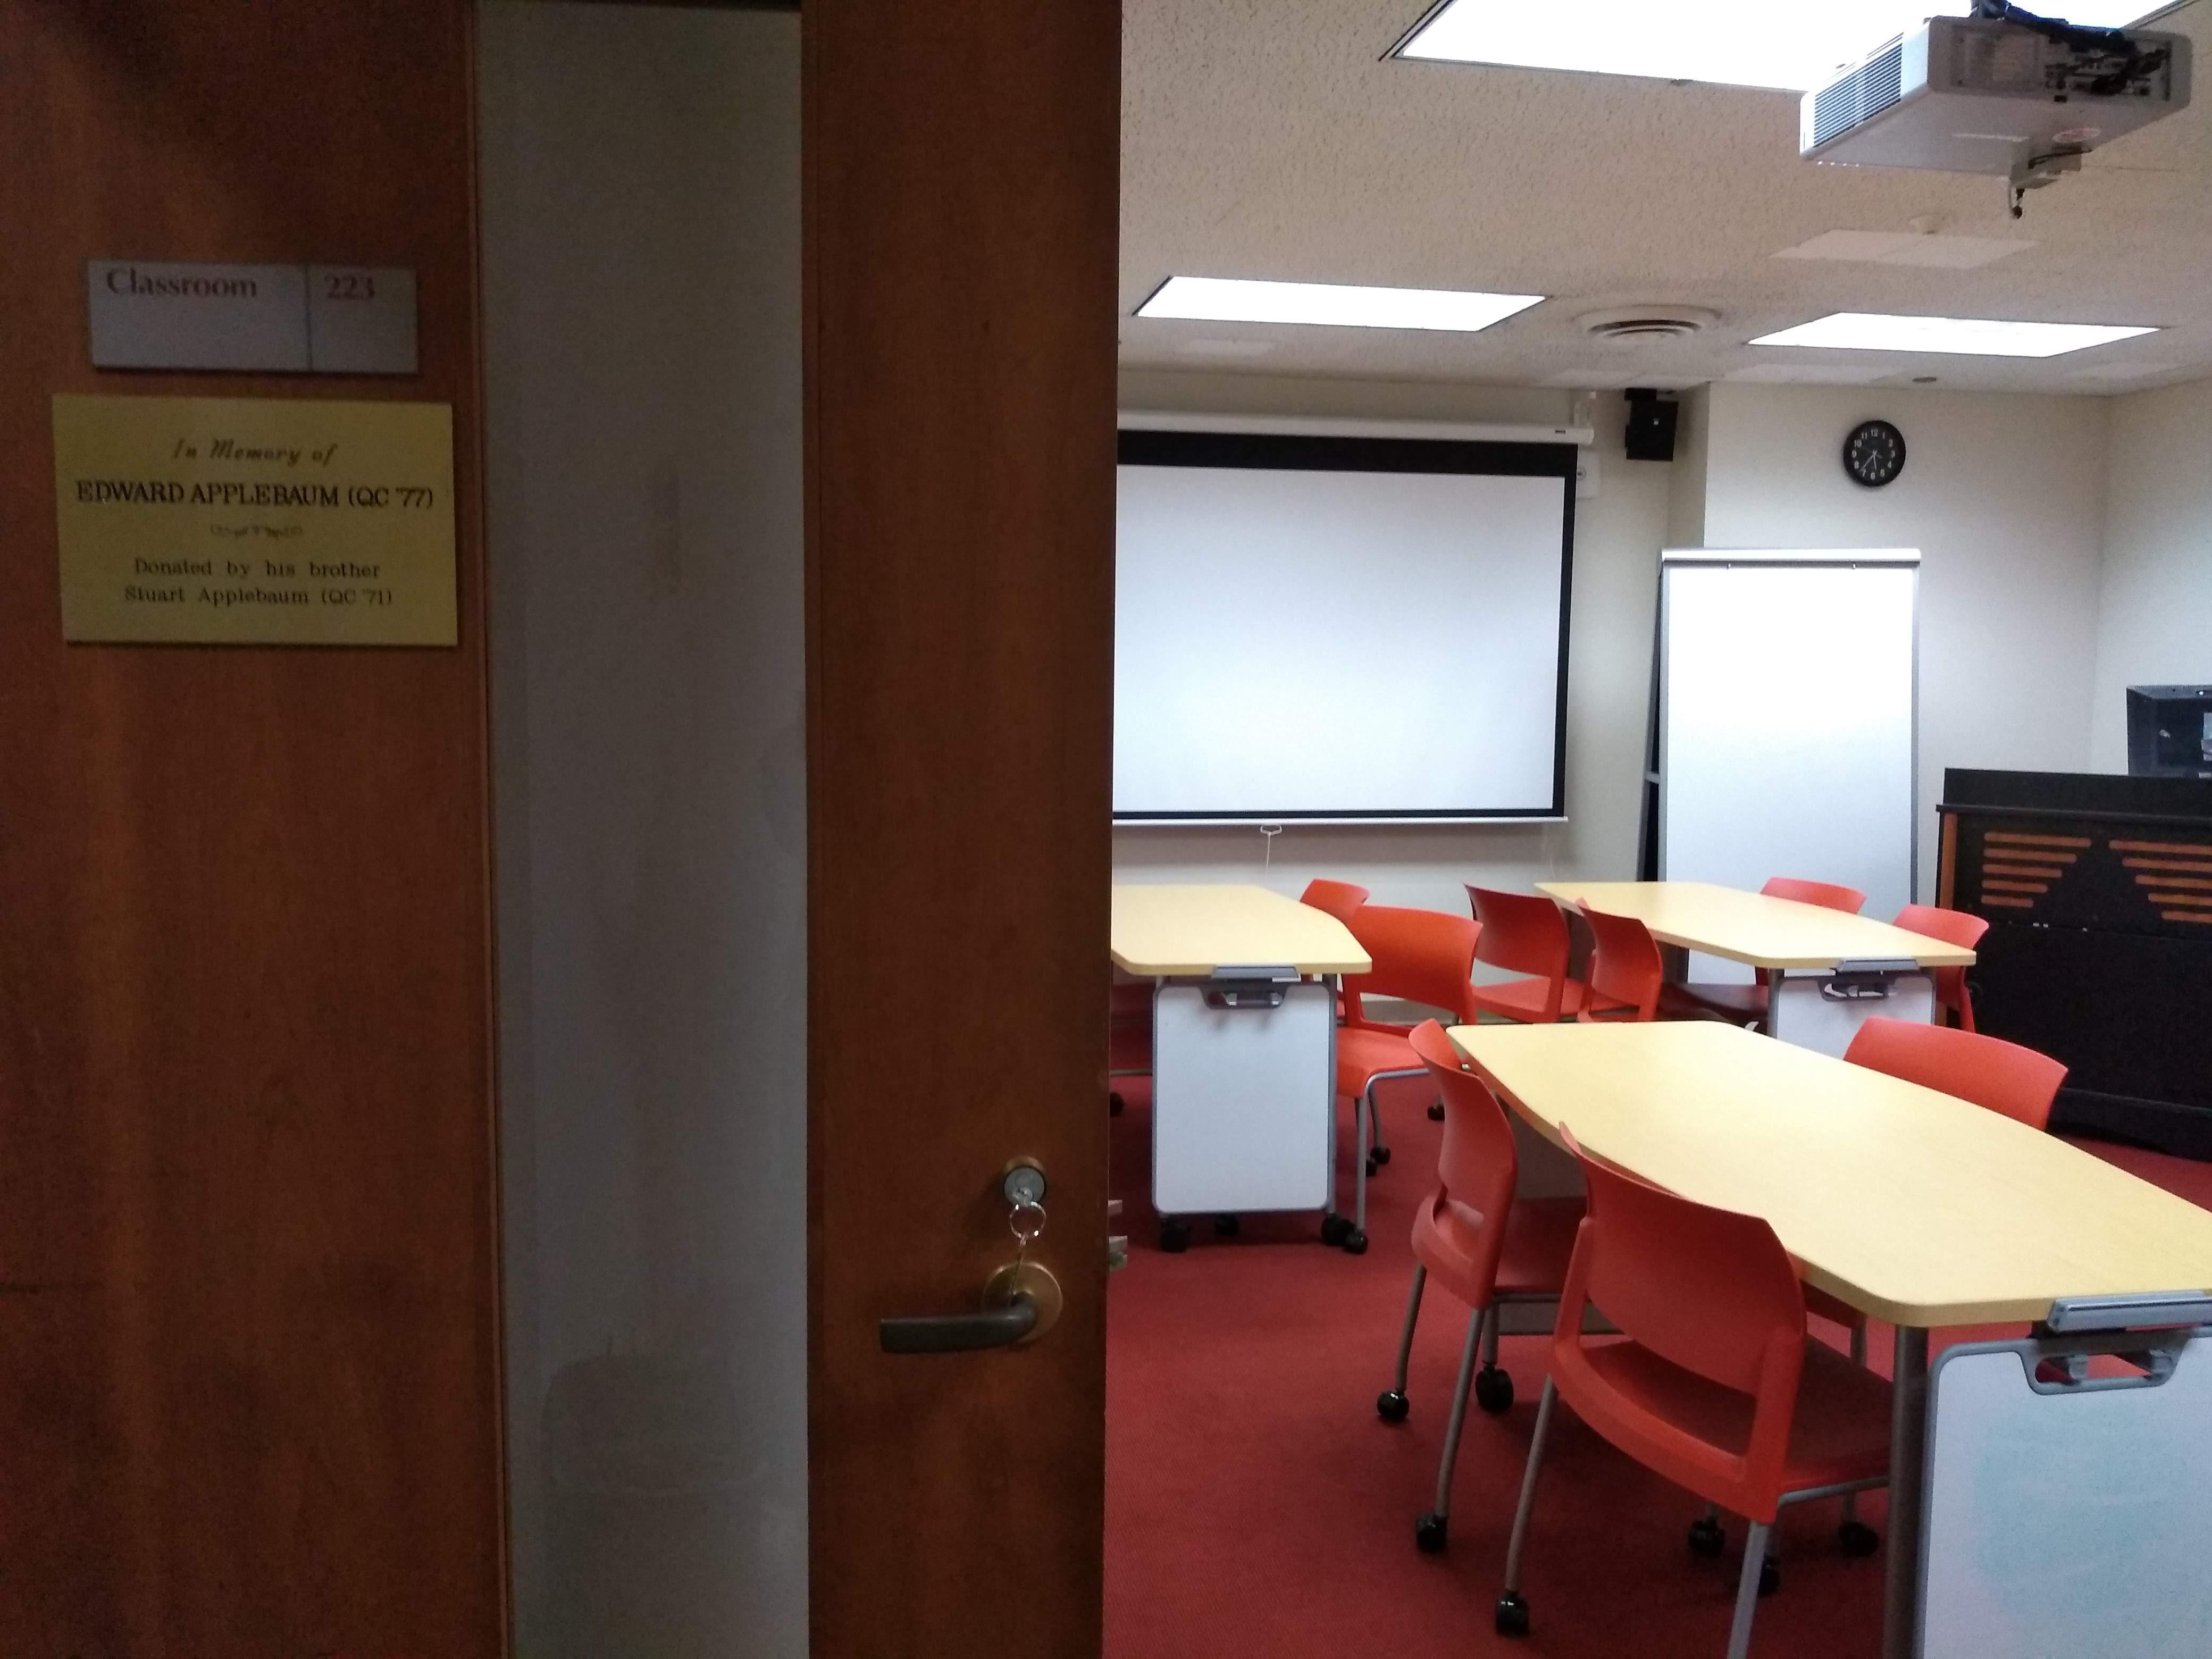 Classroom 223